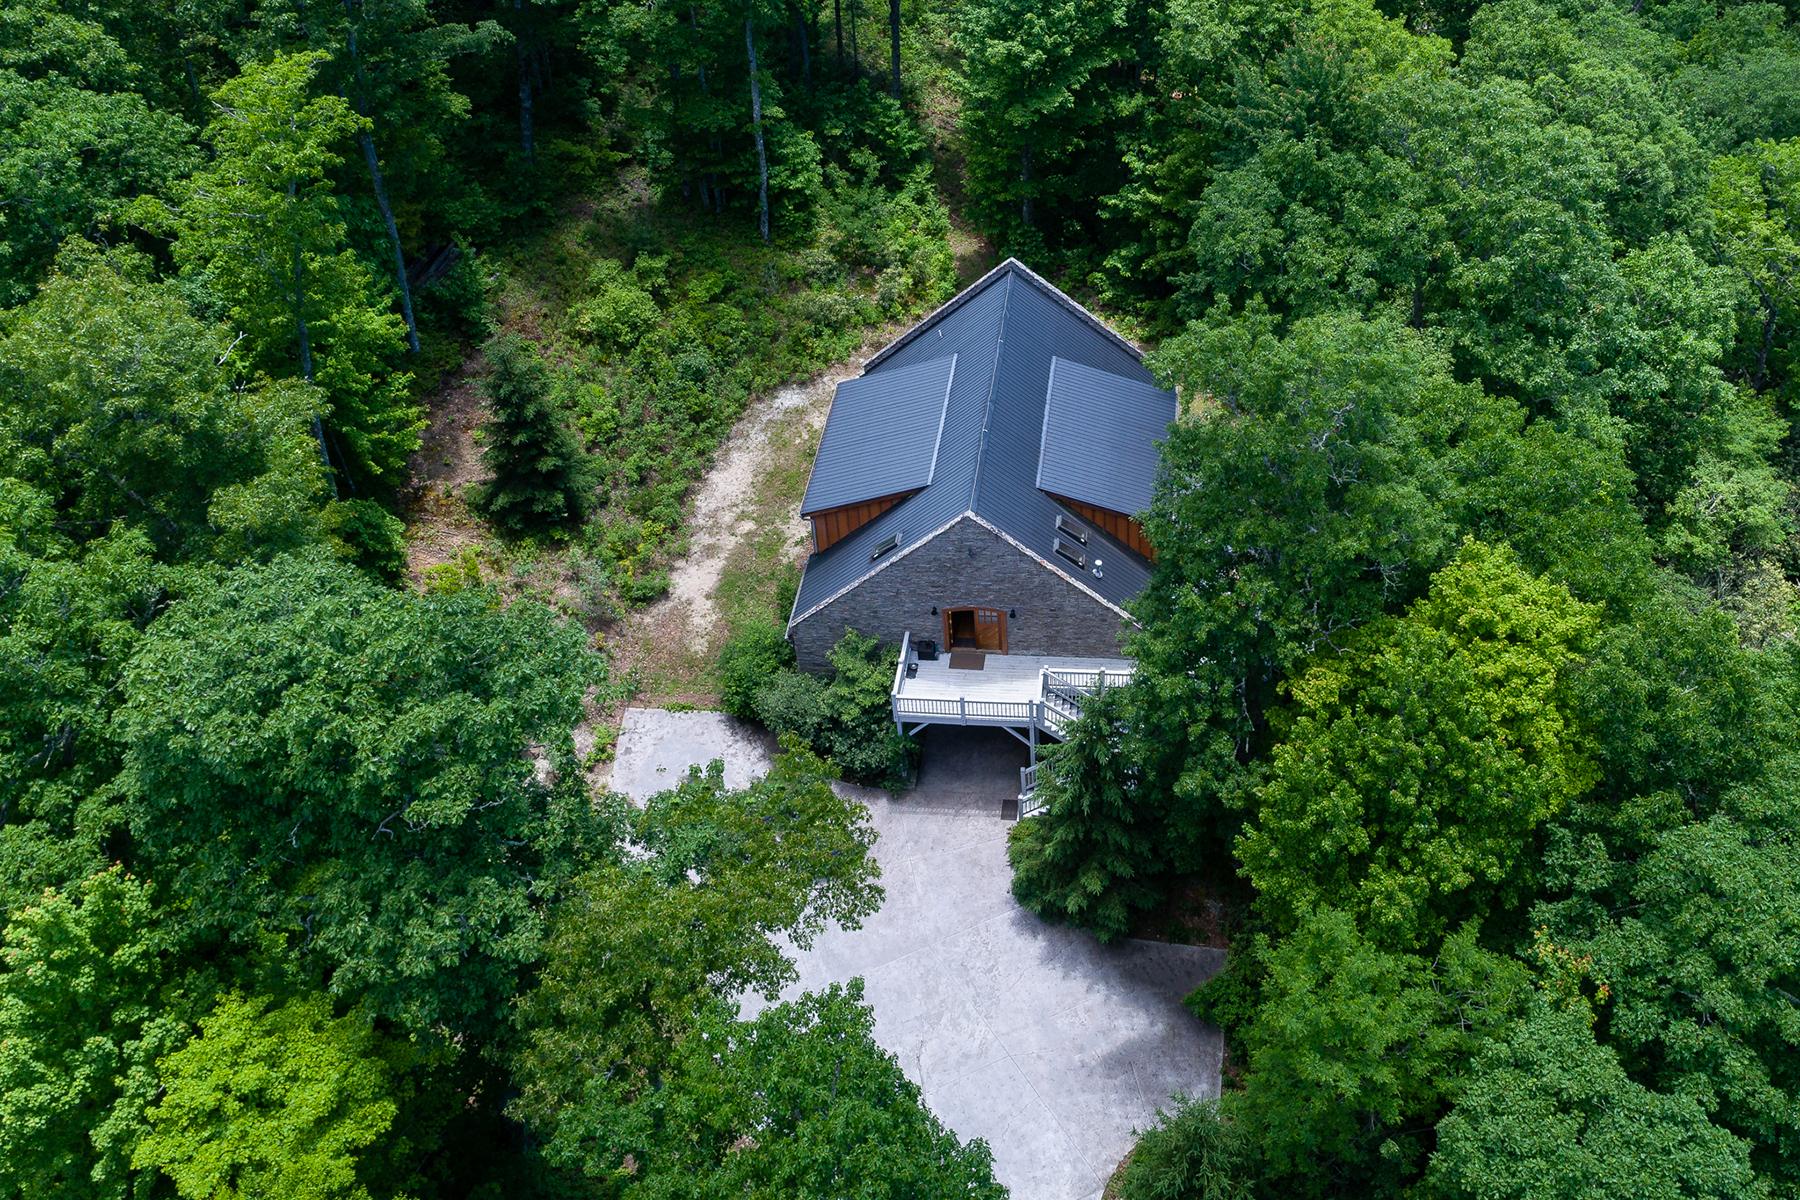 Single Family Homes for Active at GLENVILLE 532 Fox Knob Drive Glenville, North Carolina 28736 United States